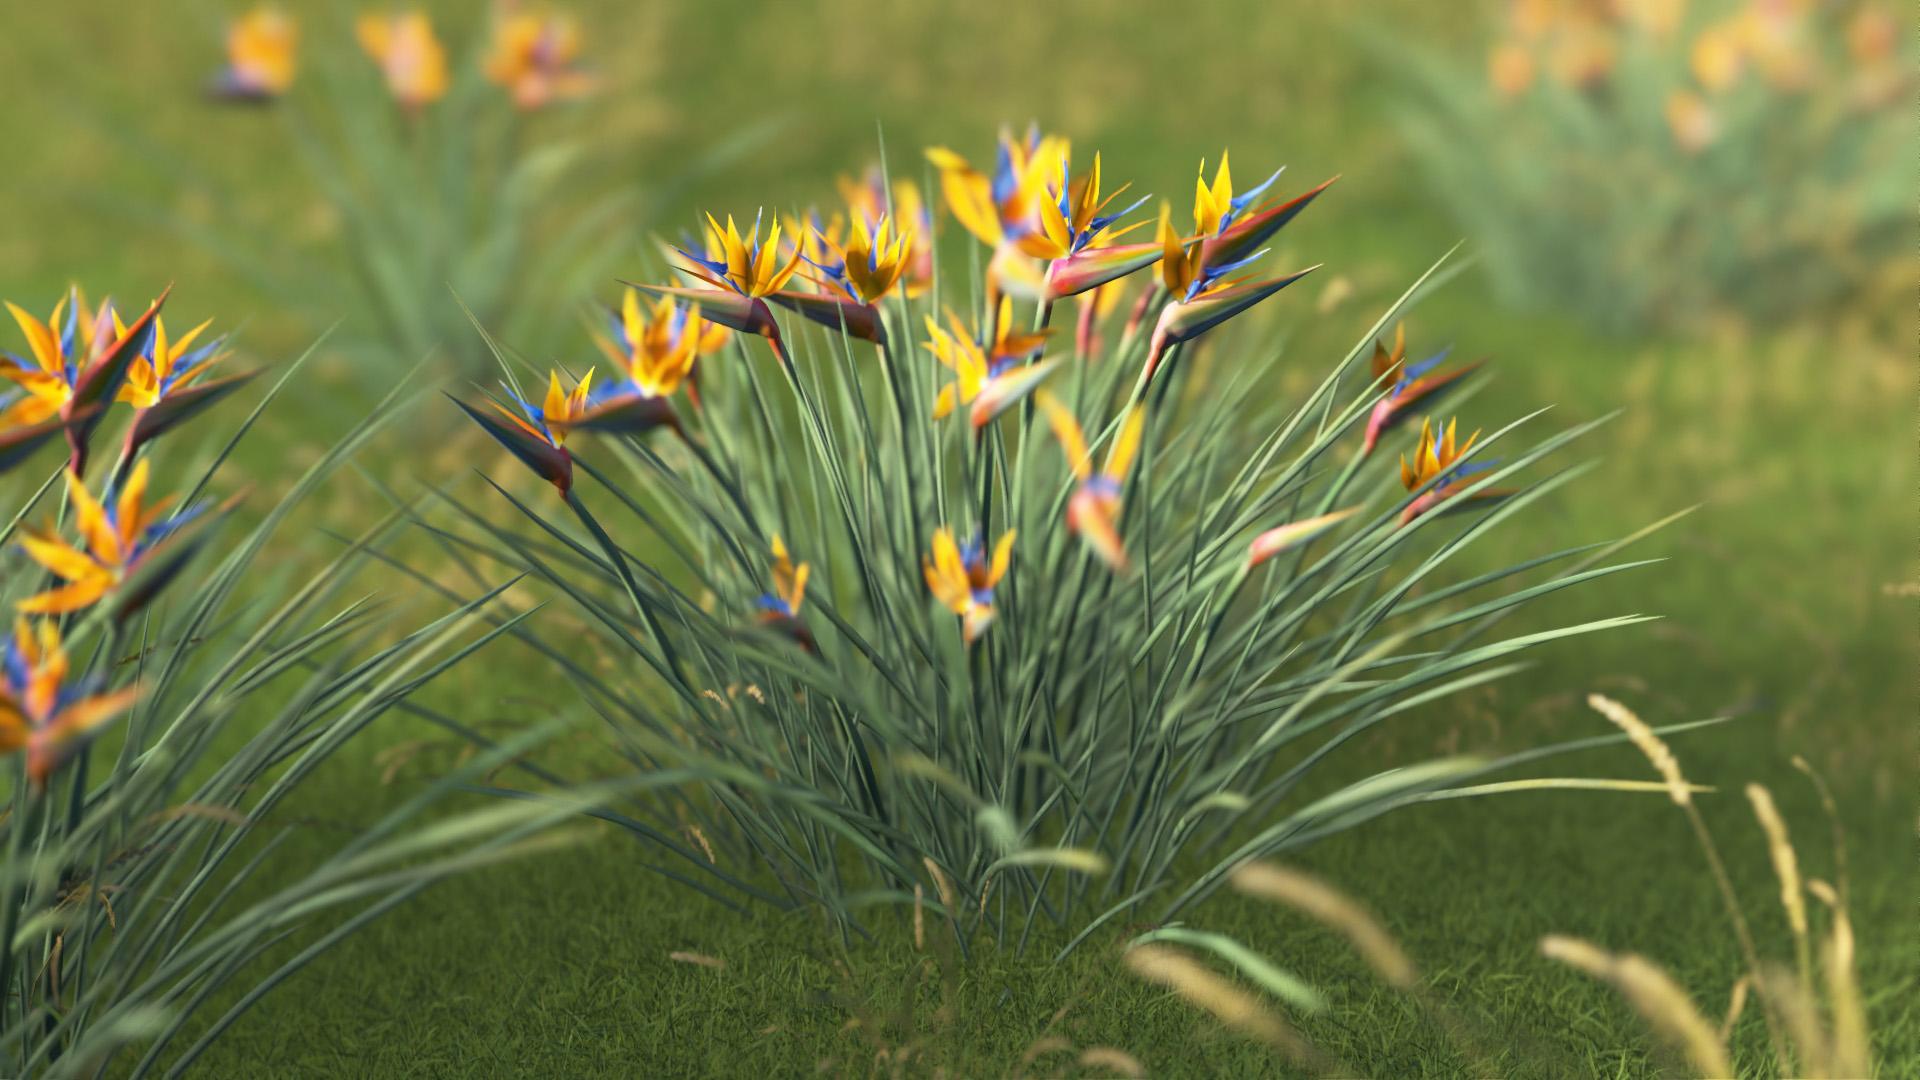 3D model of the Narrow leaved bird of paradise Strelitzia juncea close-up